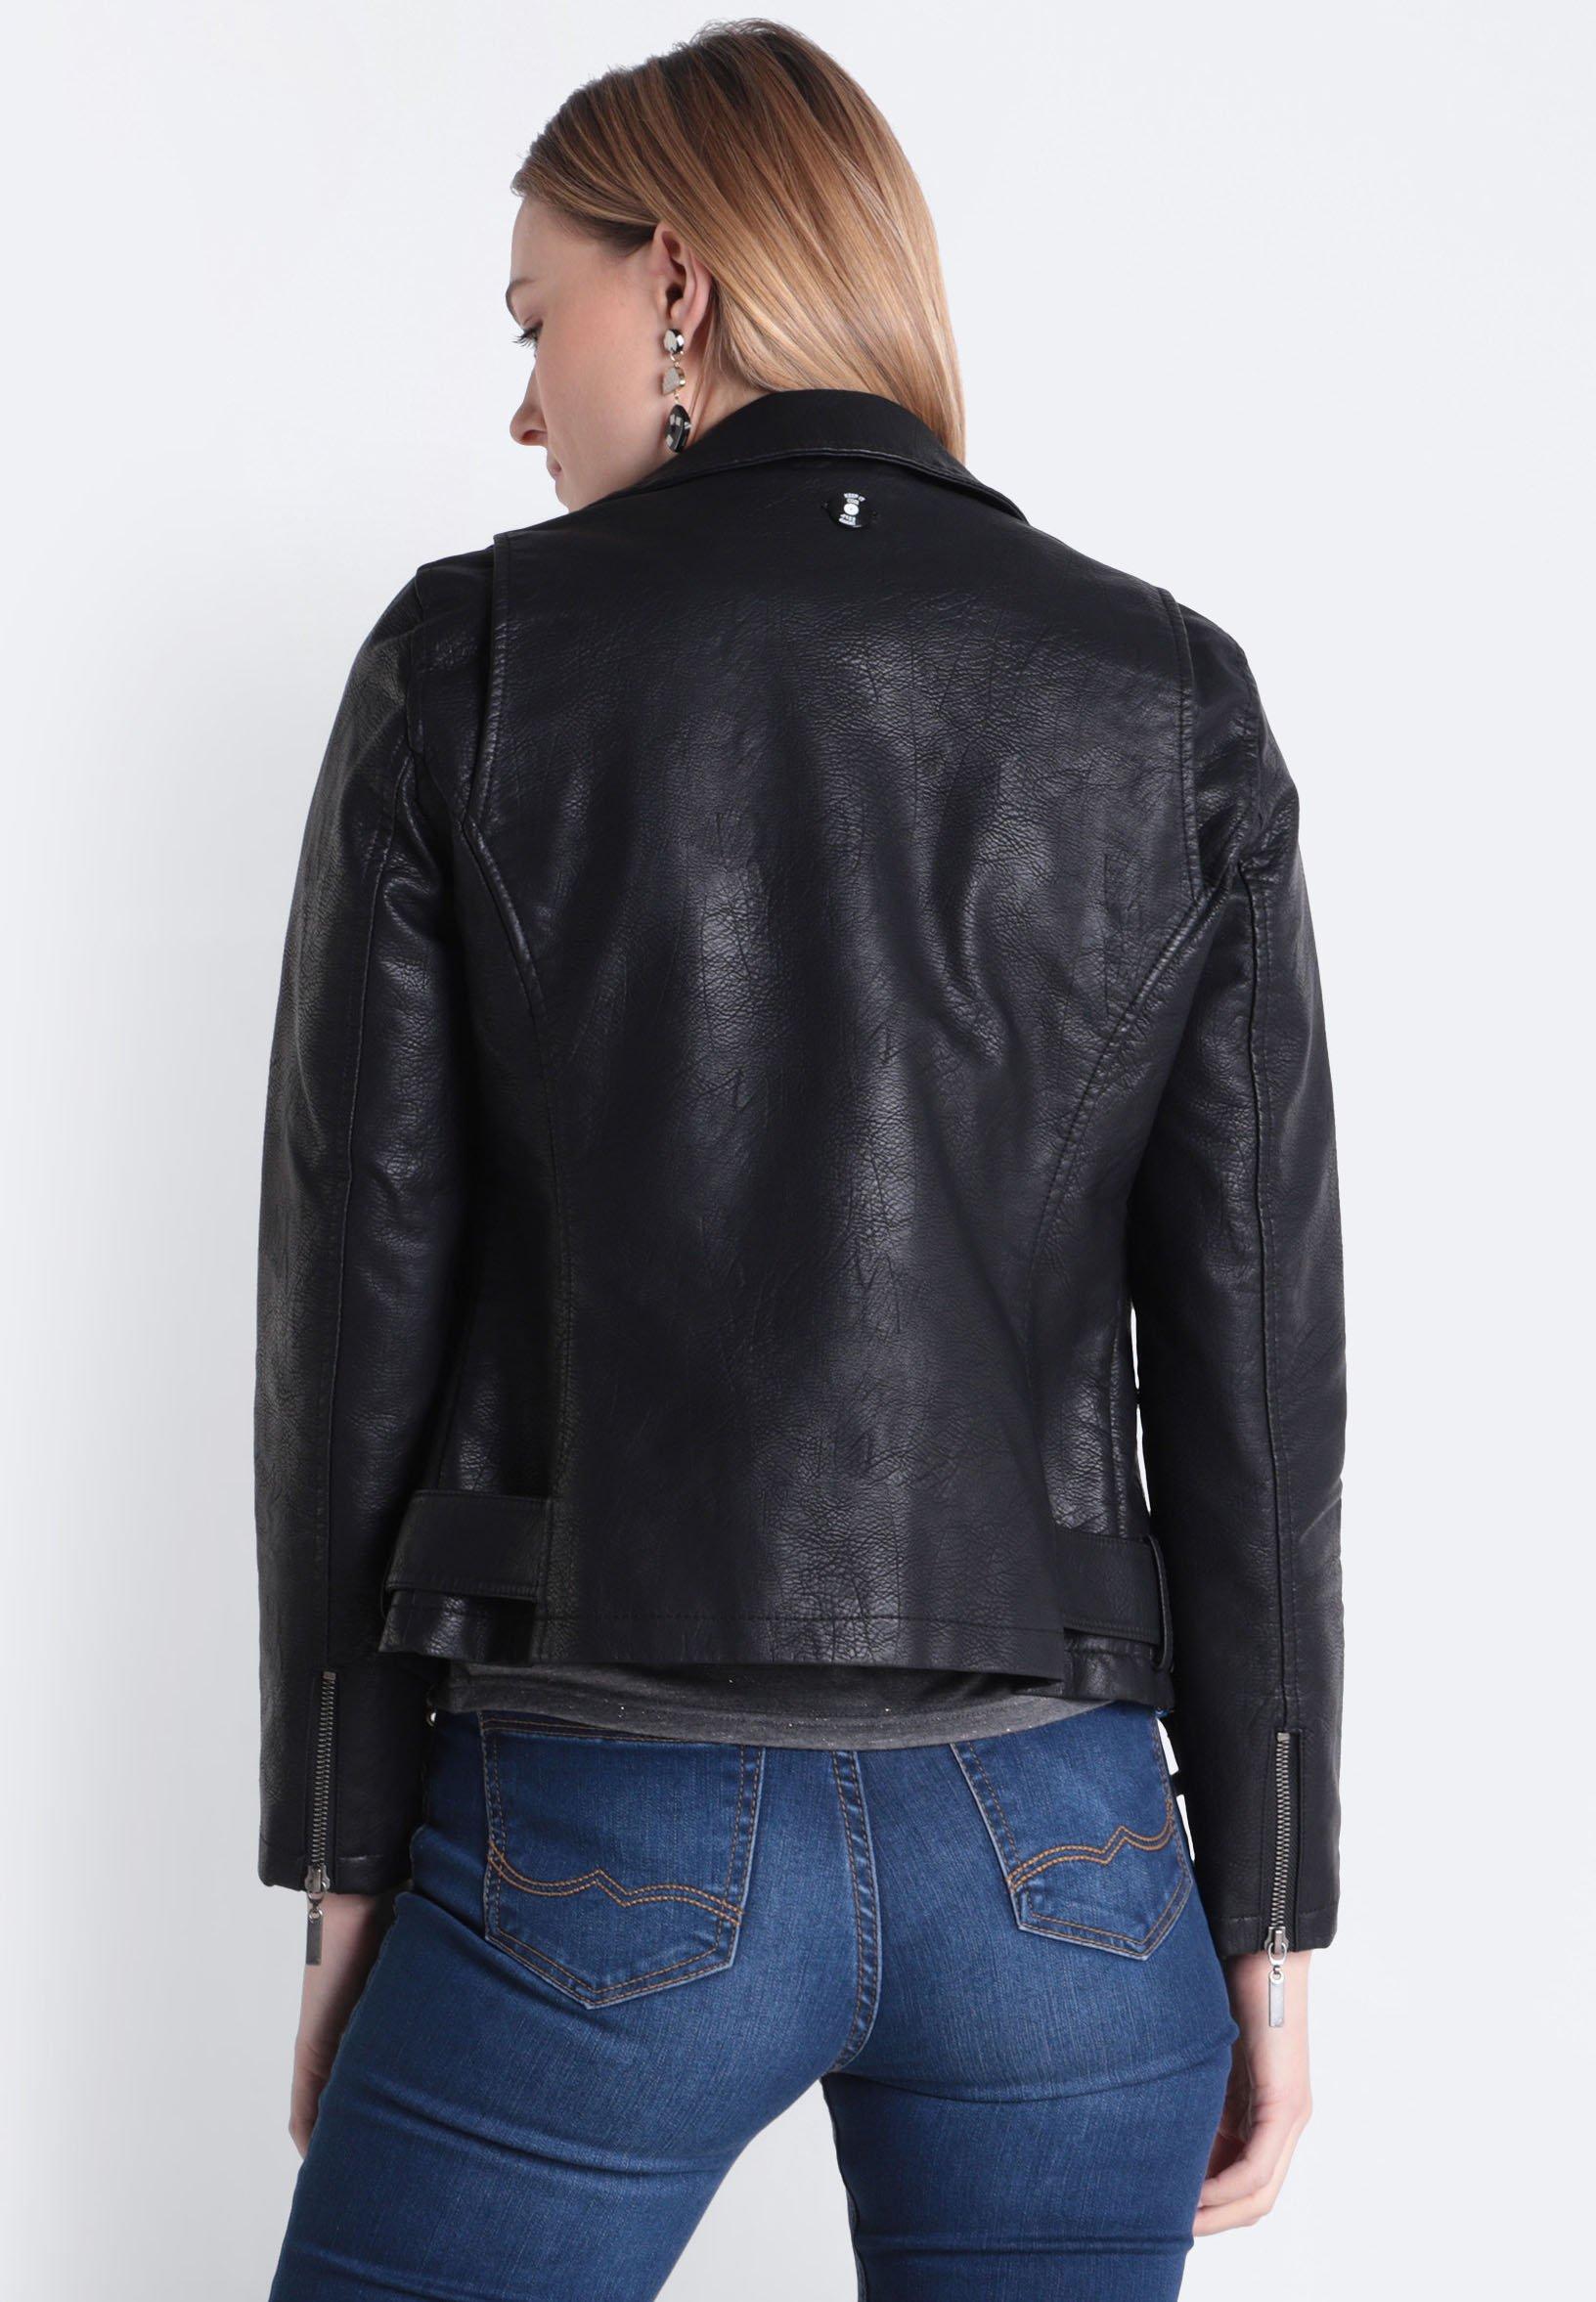 BONOBO Jeans MIT PERLENBESATZ Kunstlederjacke black/schwarz